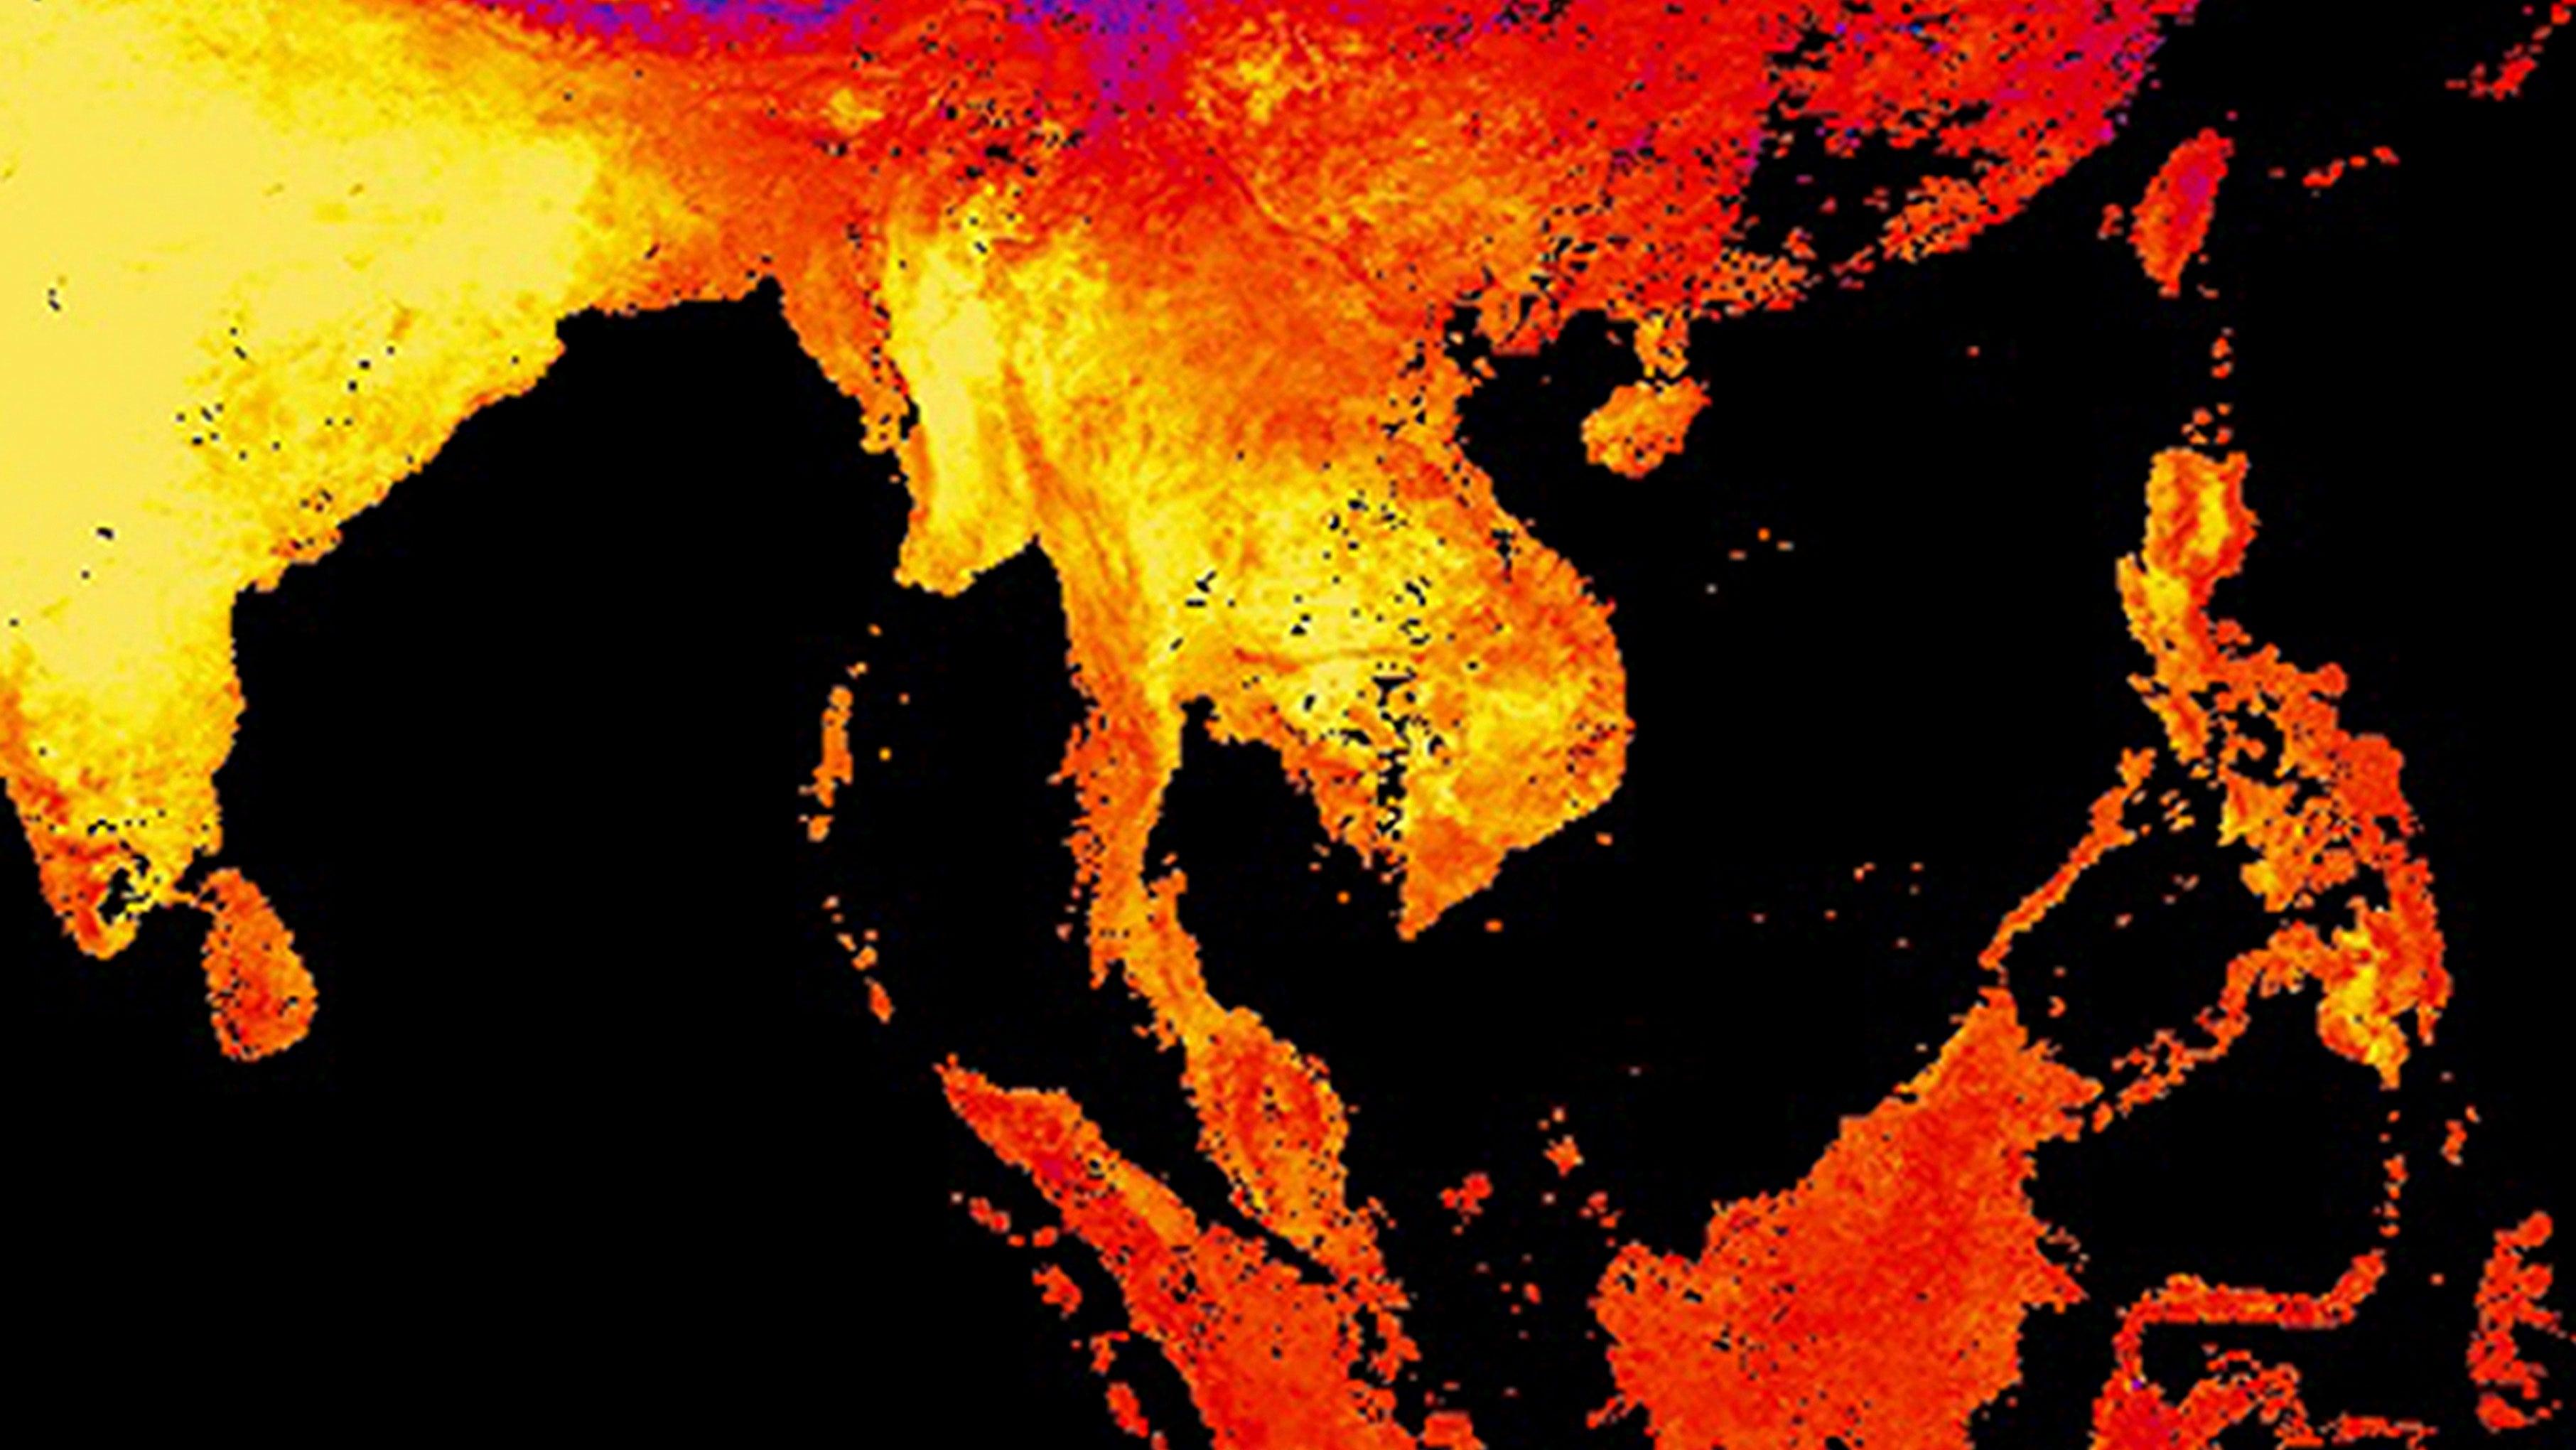 Thailand's Insane Heatwave: A Month Above 104 Degrees